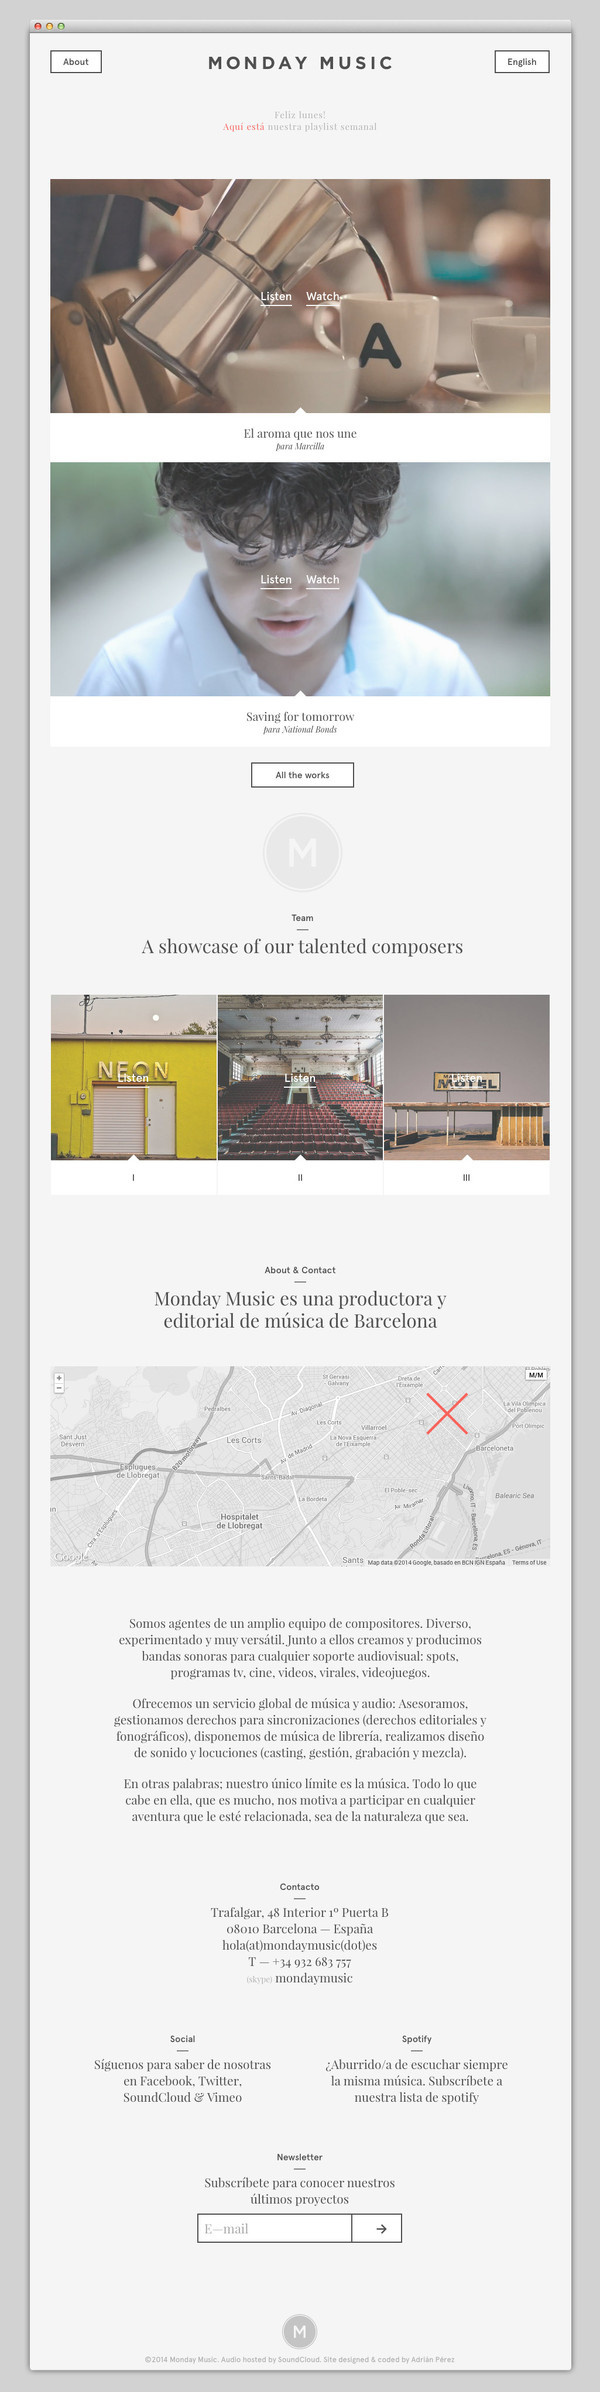 Monday Music #website #layout #design #web